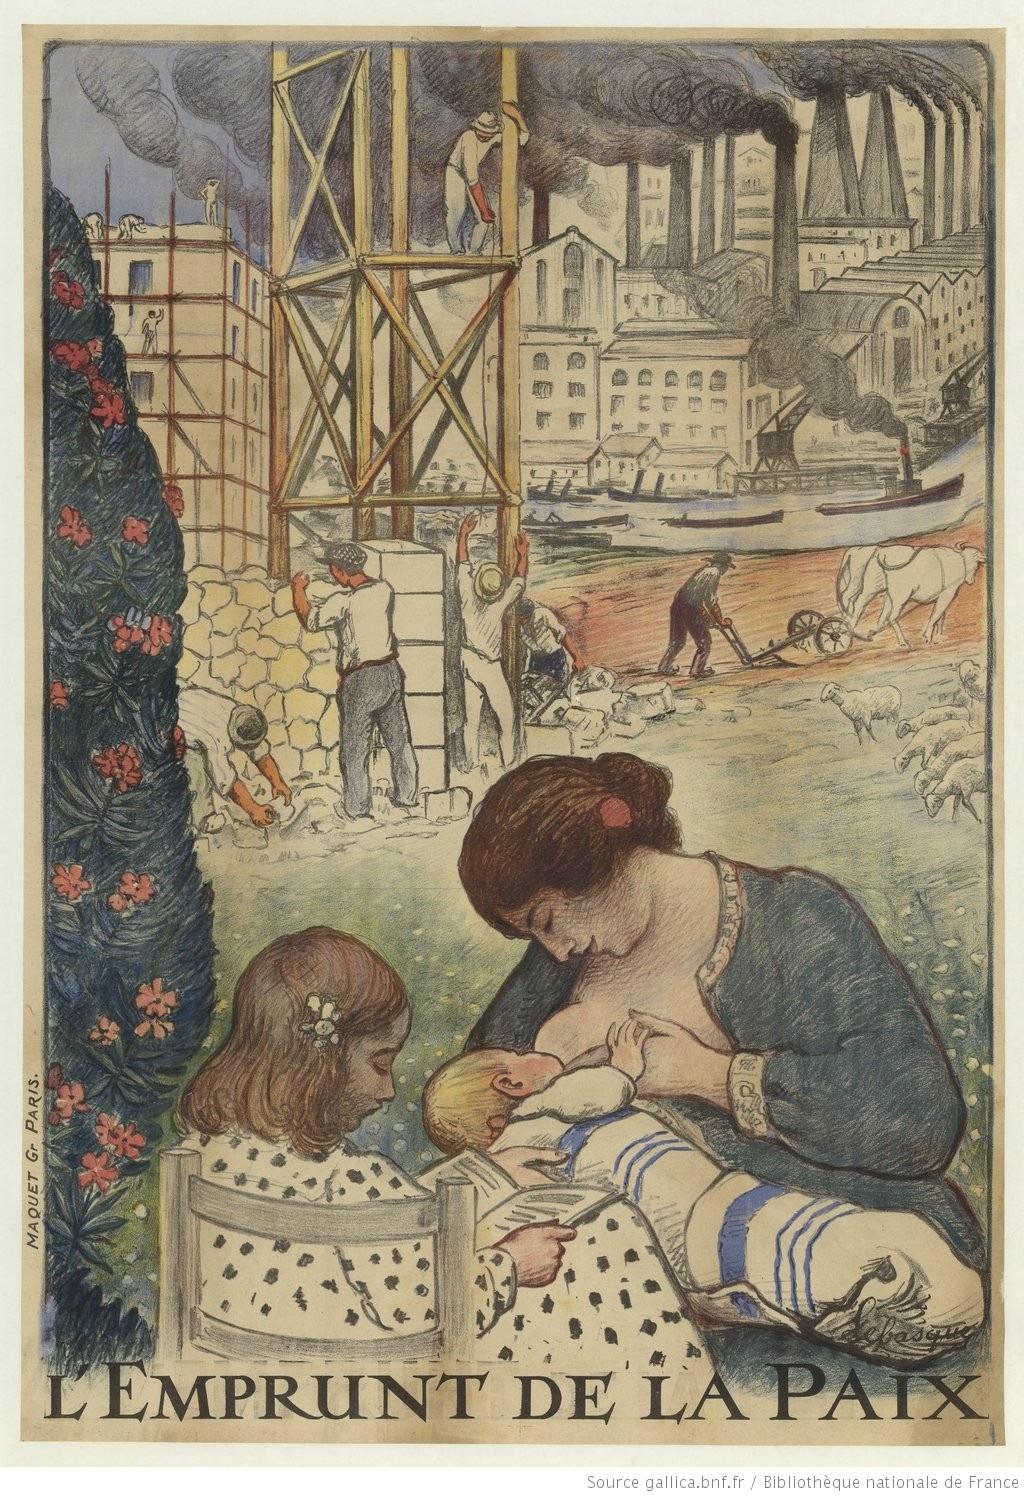 lemprunt-de-la-paix-1917